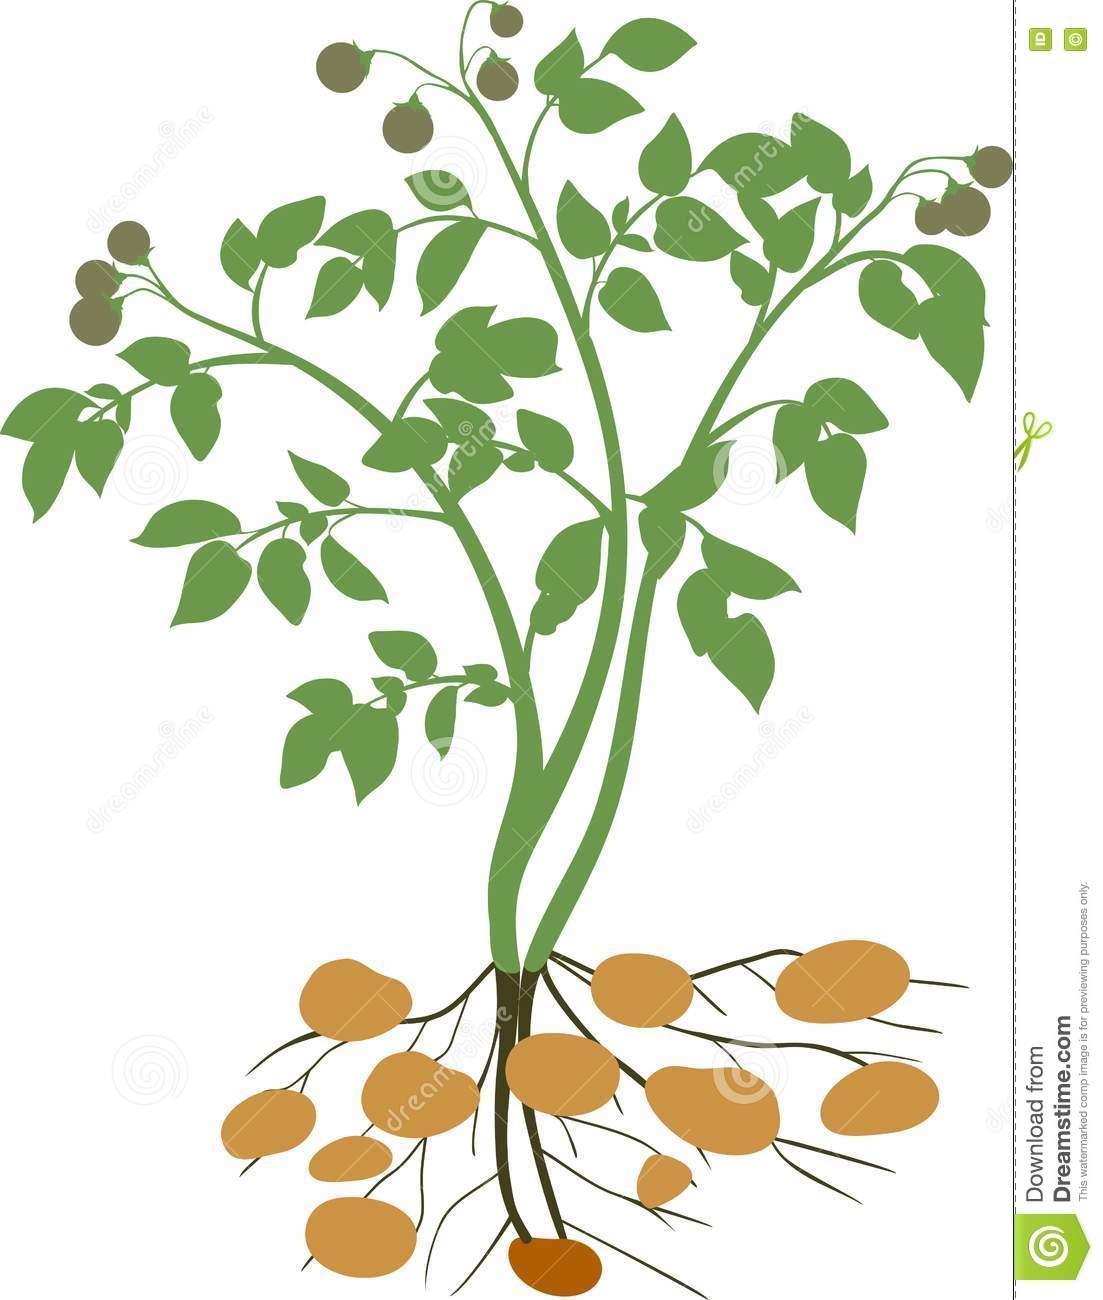 Potato Plant Silhouette Stock Vector Image: 72548736.